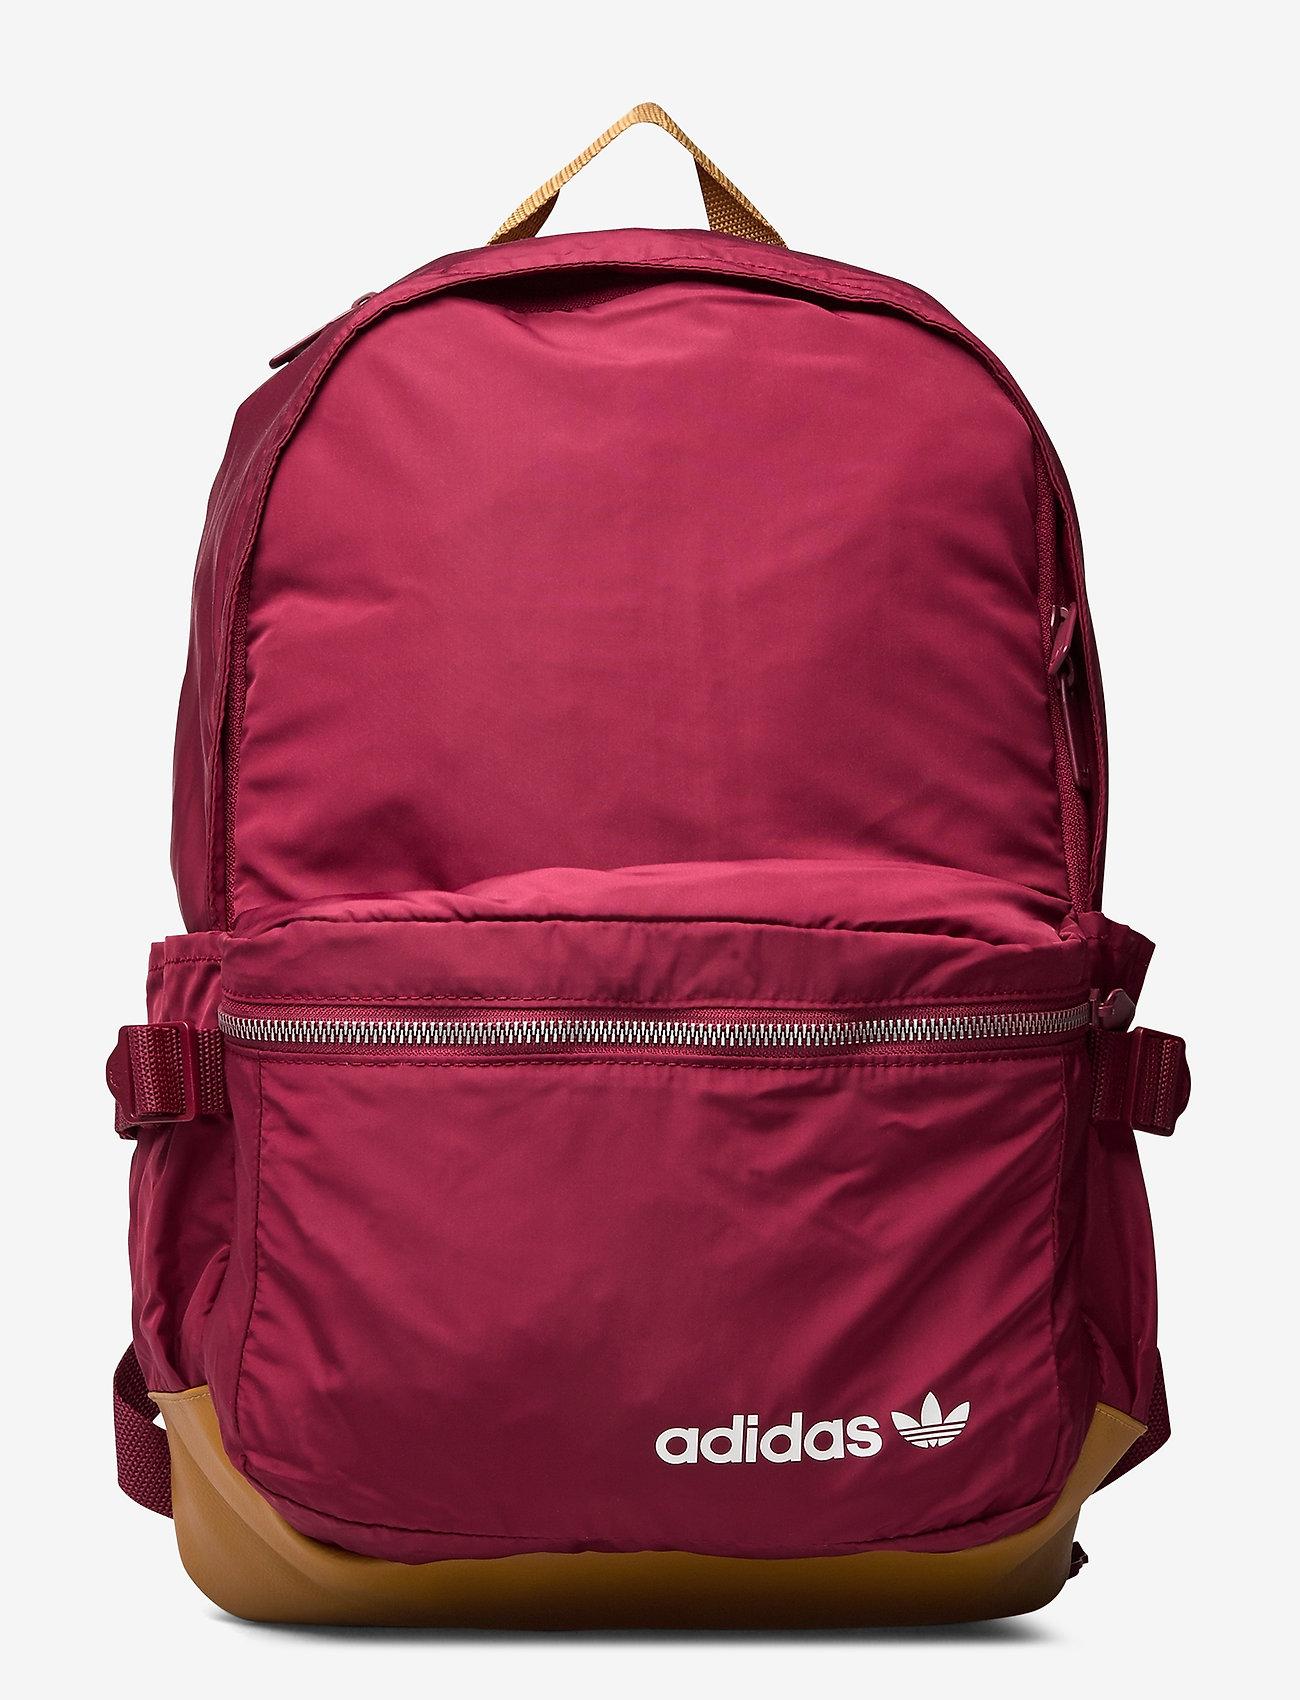 adidas Originals - PE MODERN BP - trainingstassen - cburgu/mesa - 0